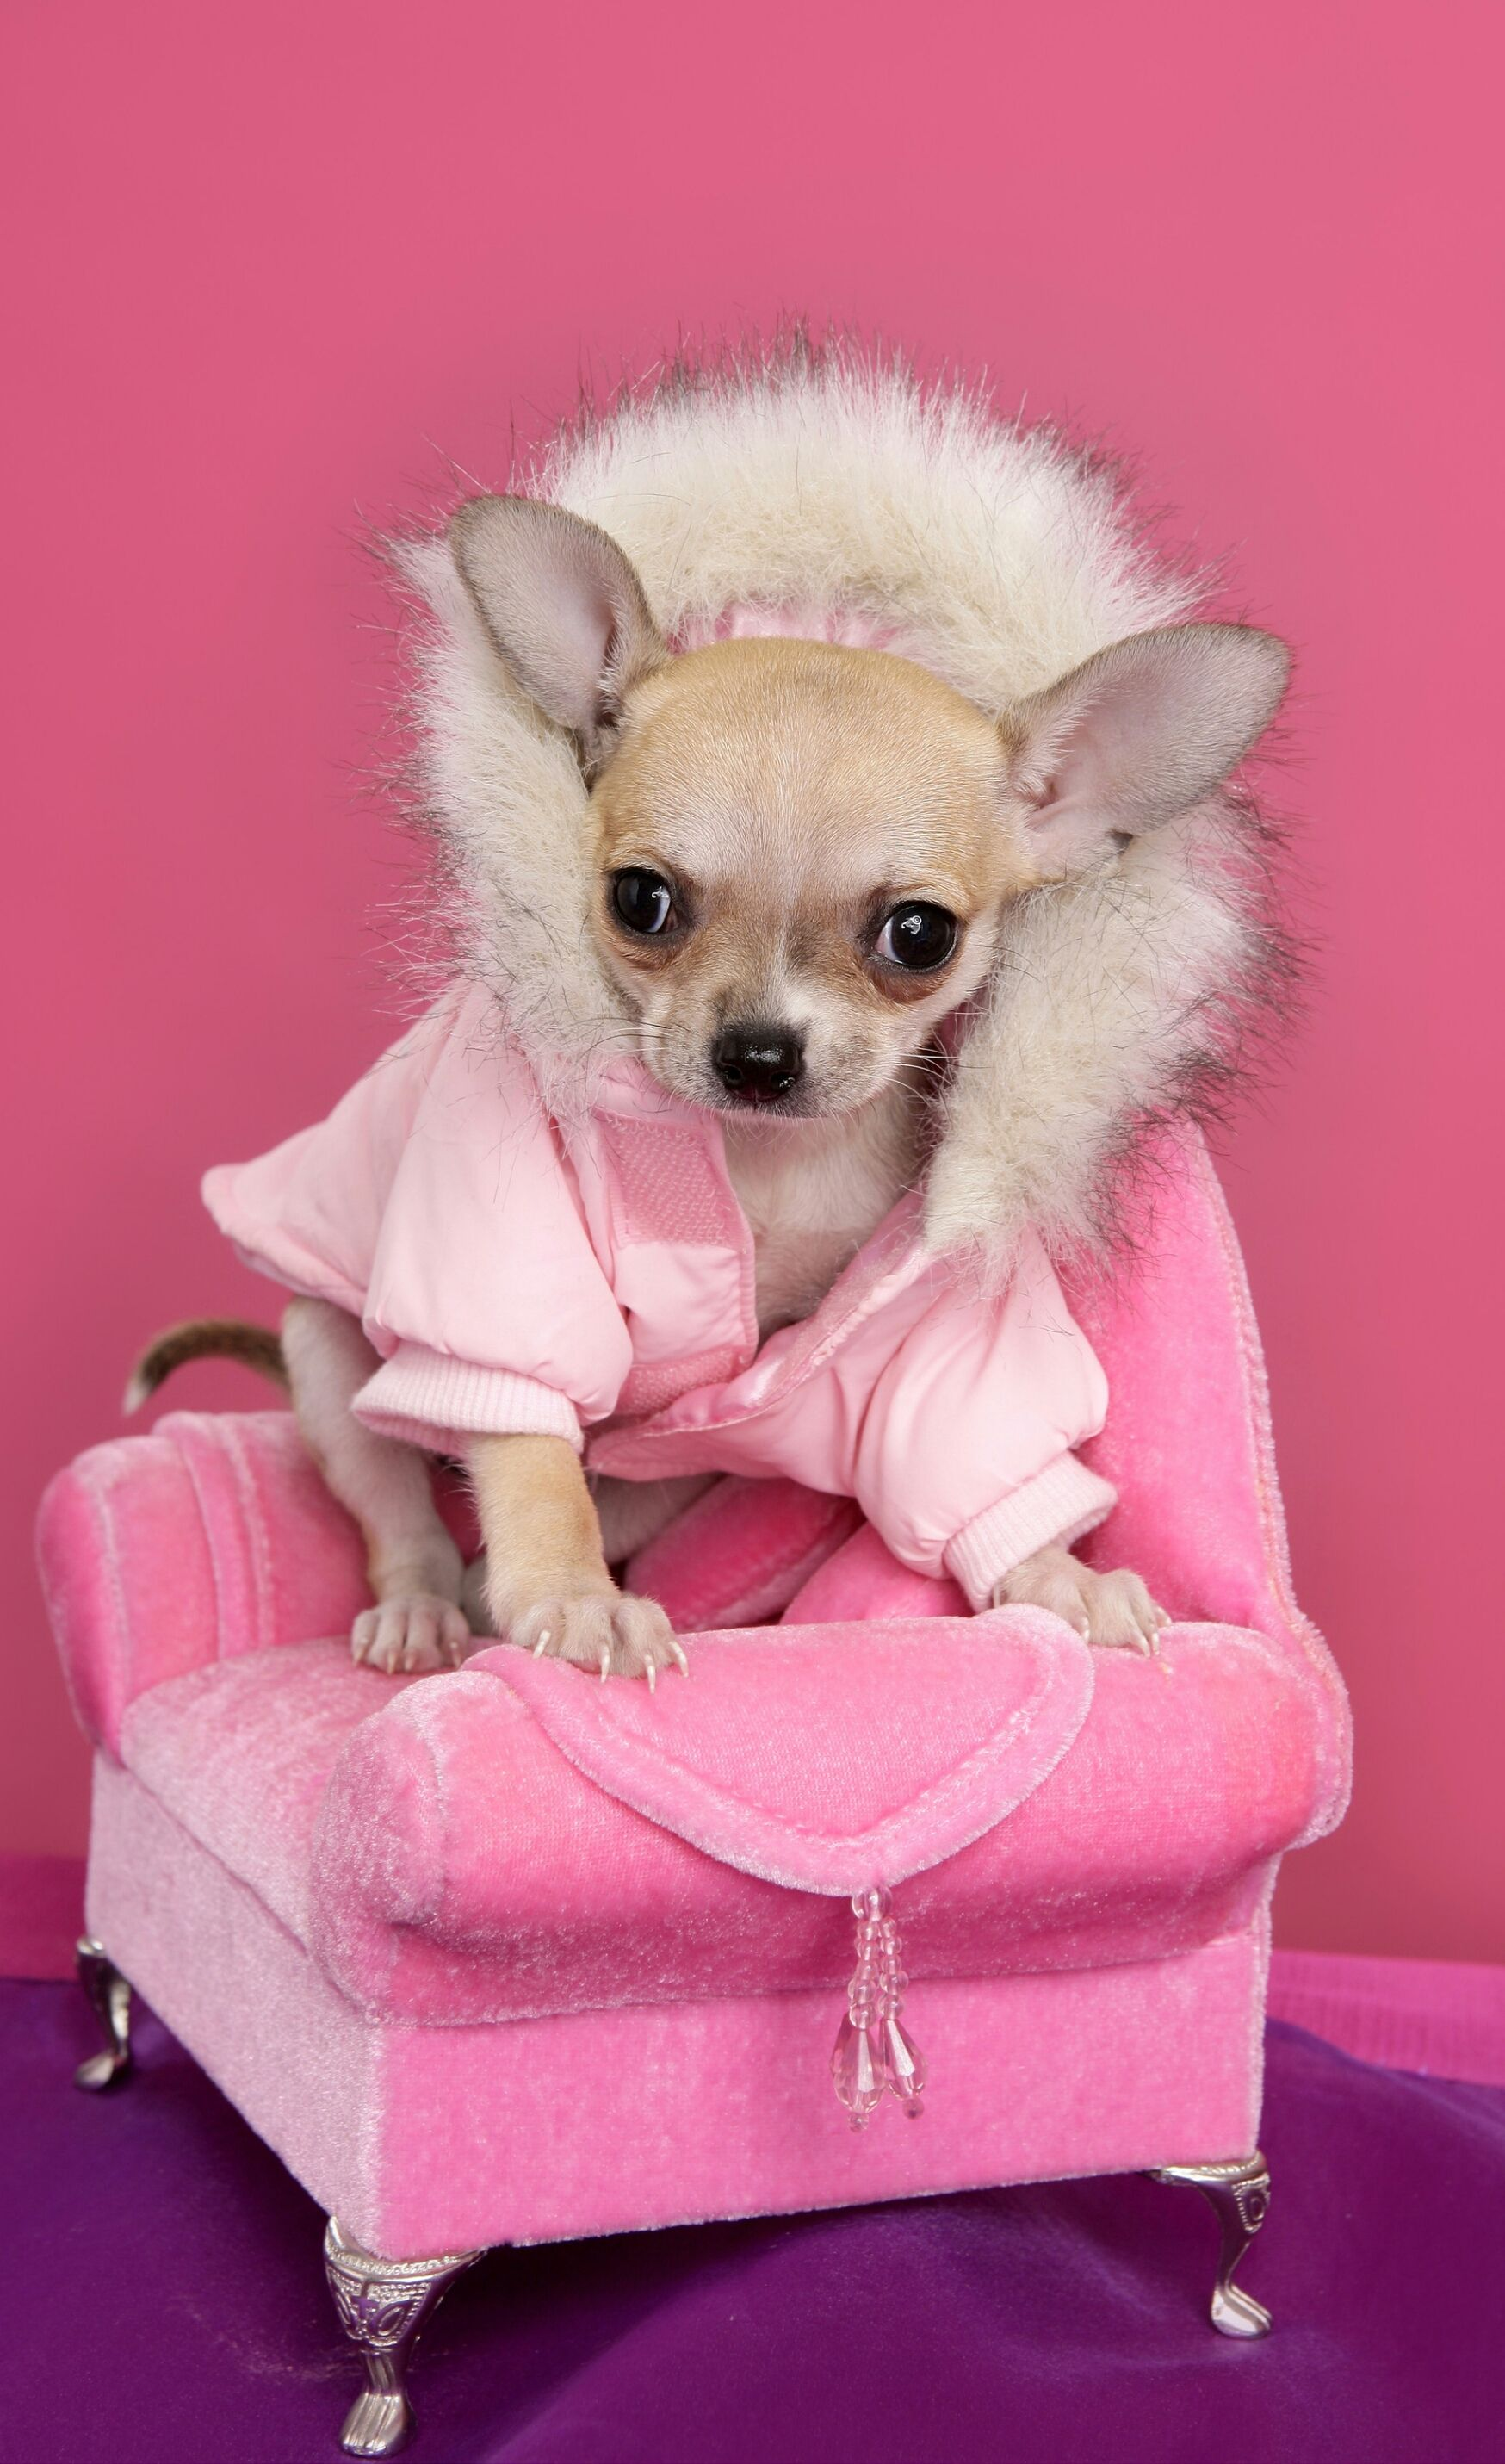 Pin de Whima Qr en Mascotas preferidas Disfraces para